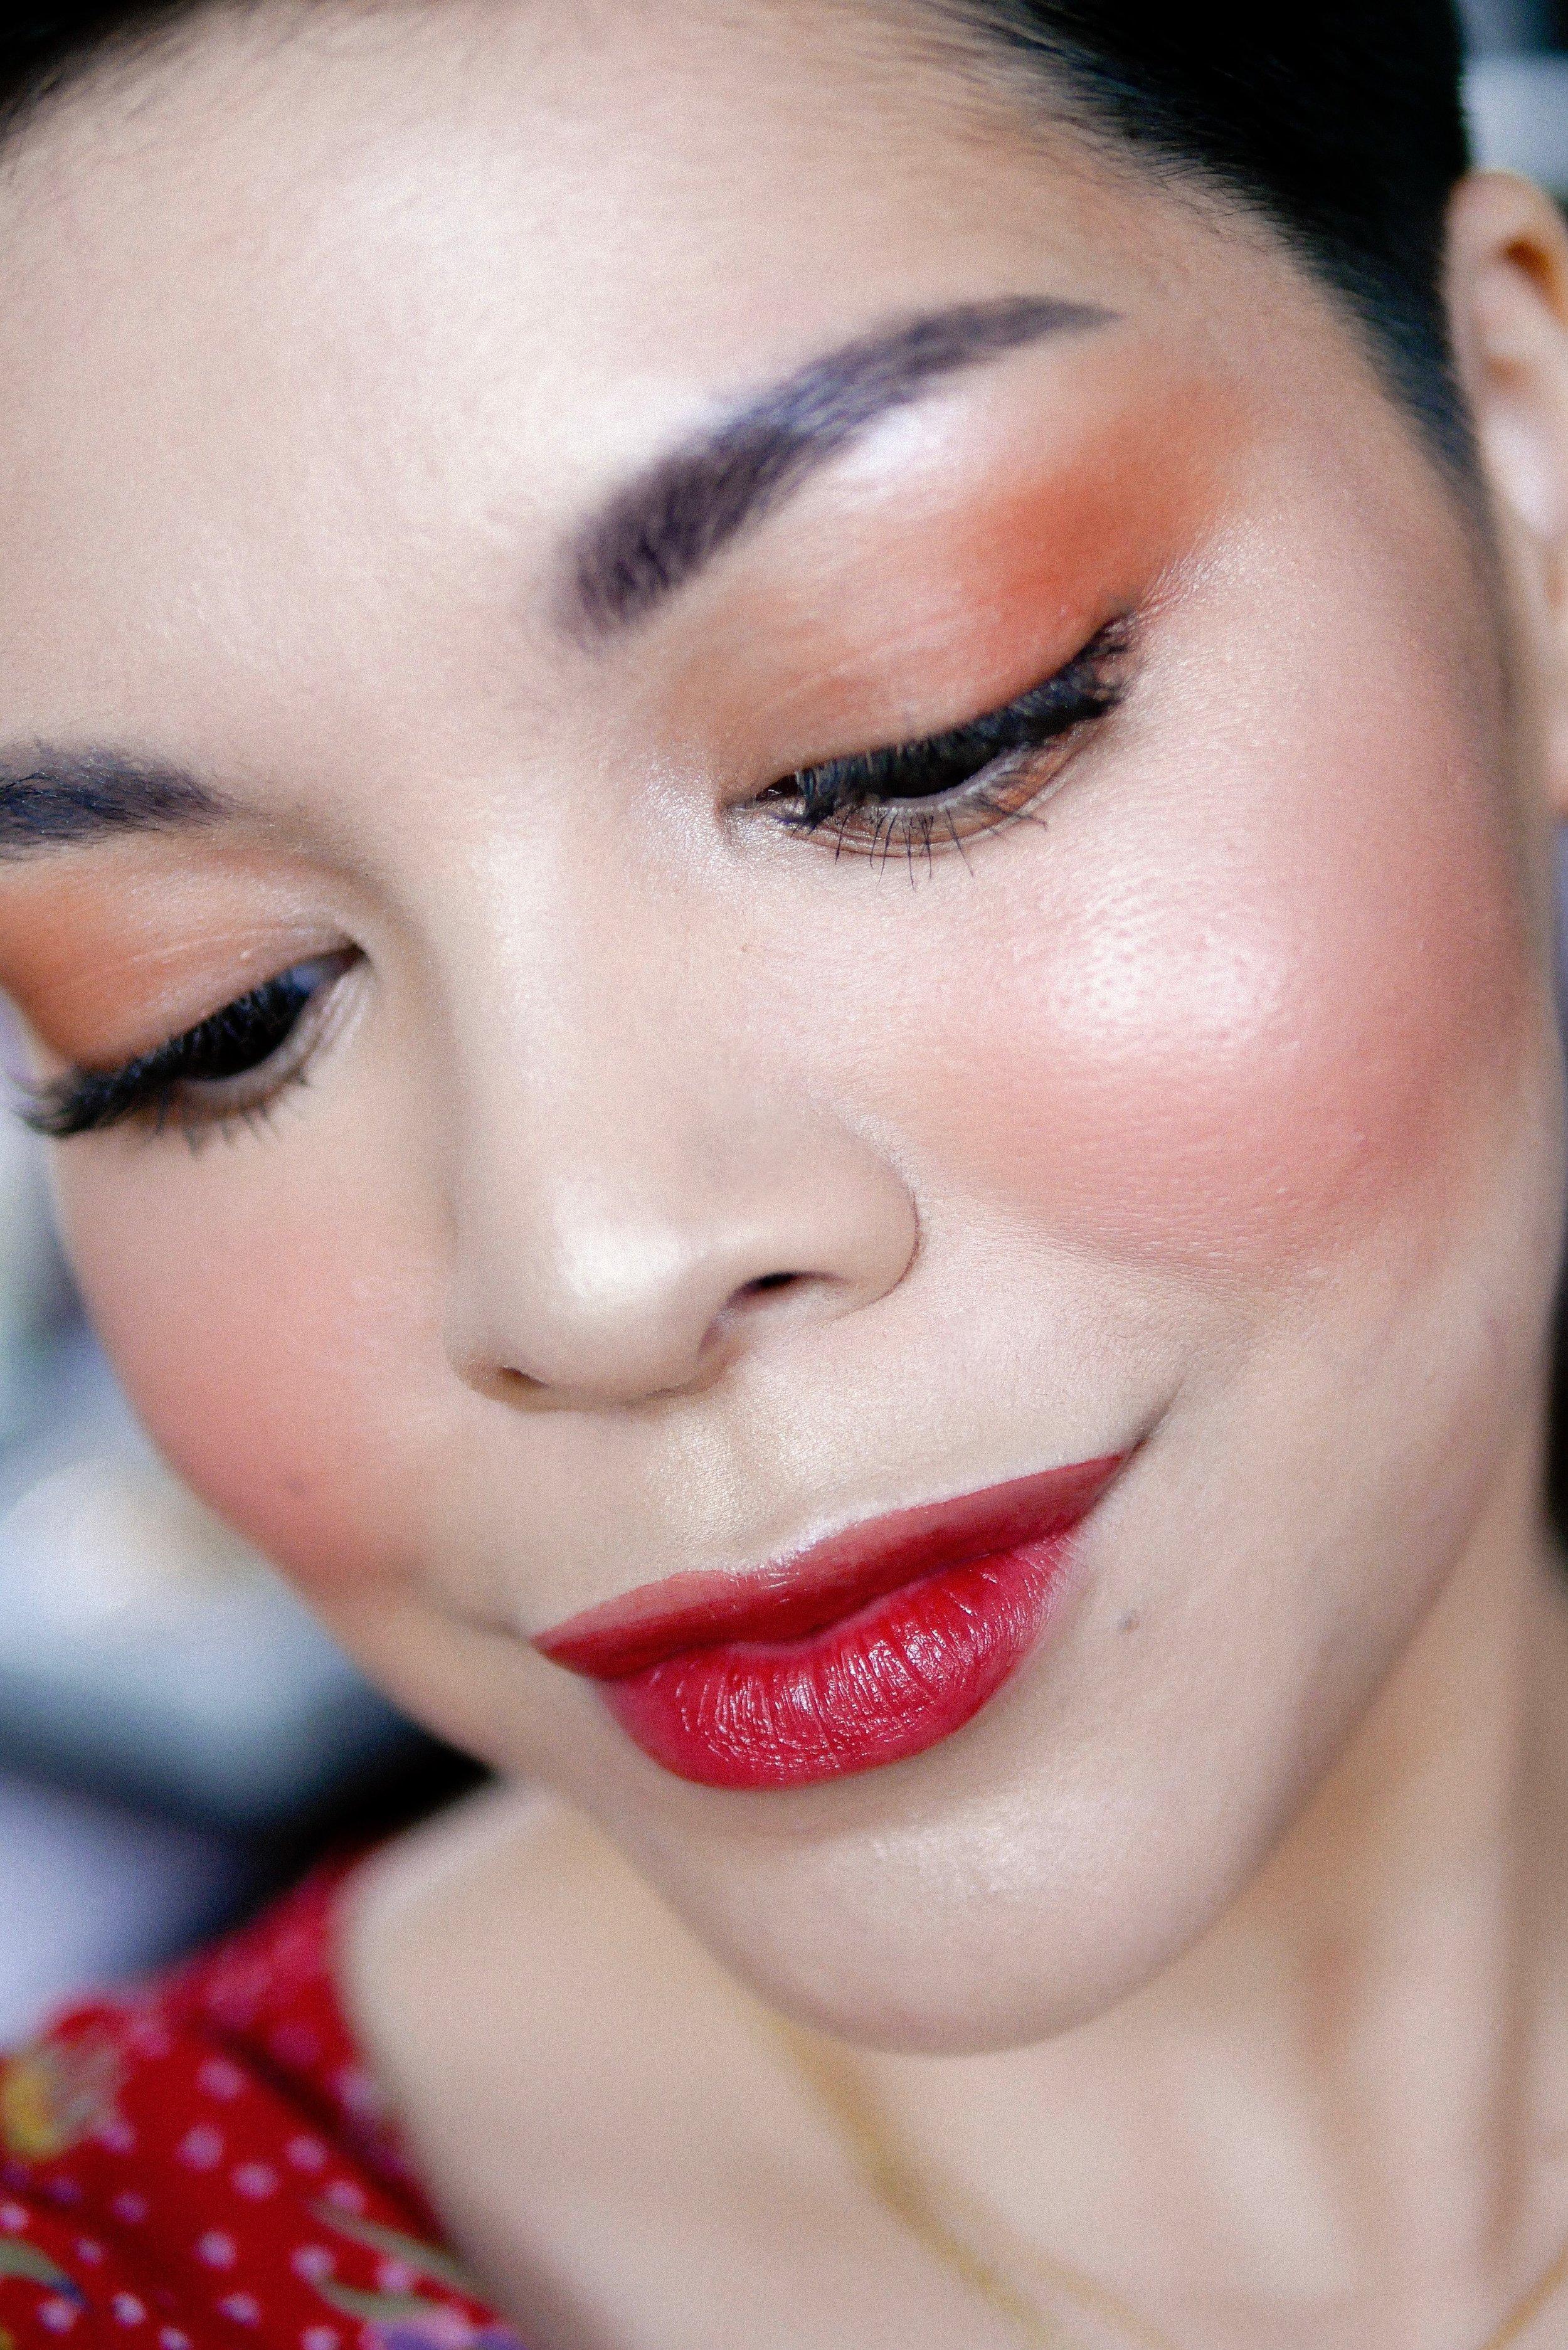 Di sini aku menggunakan  SYCA Lip Tint  shade  02. Tangerine Rose